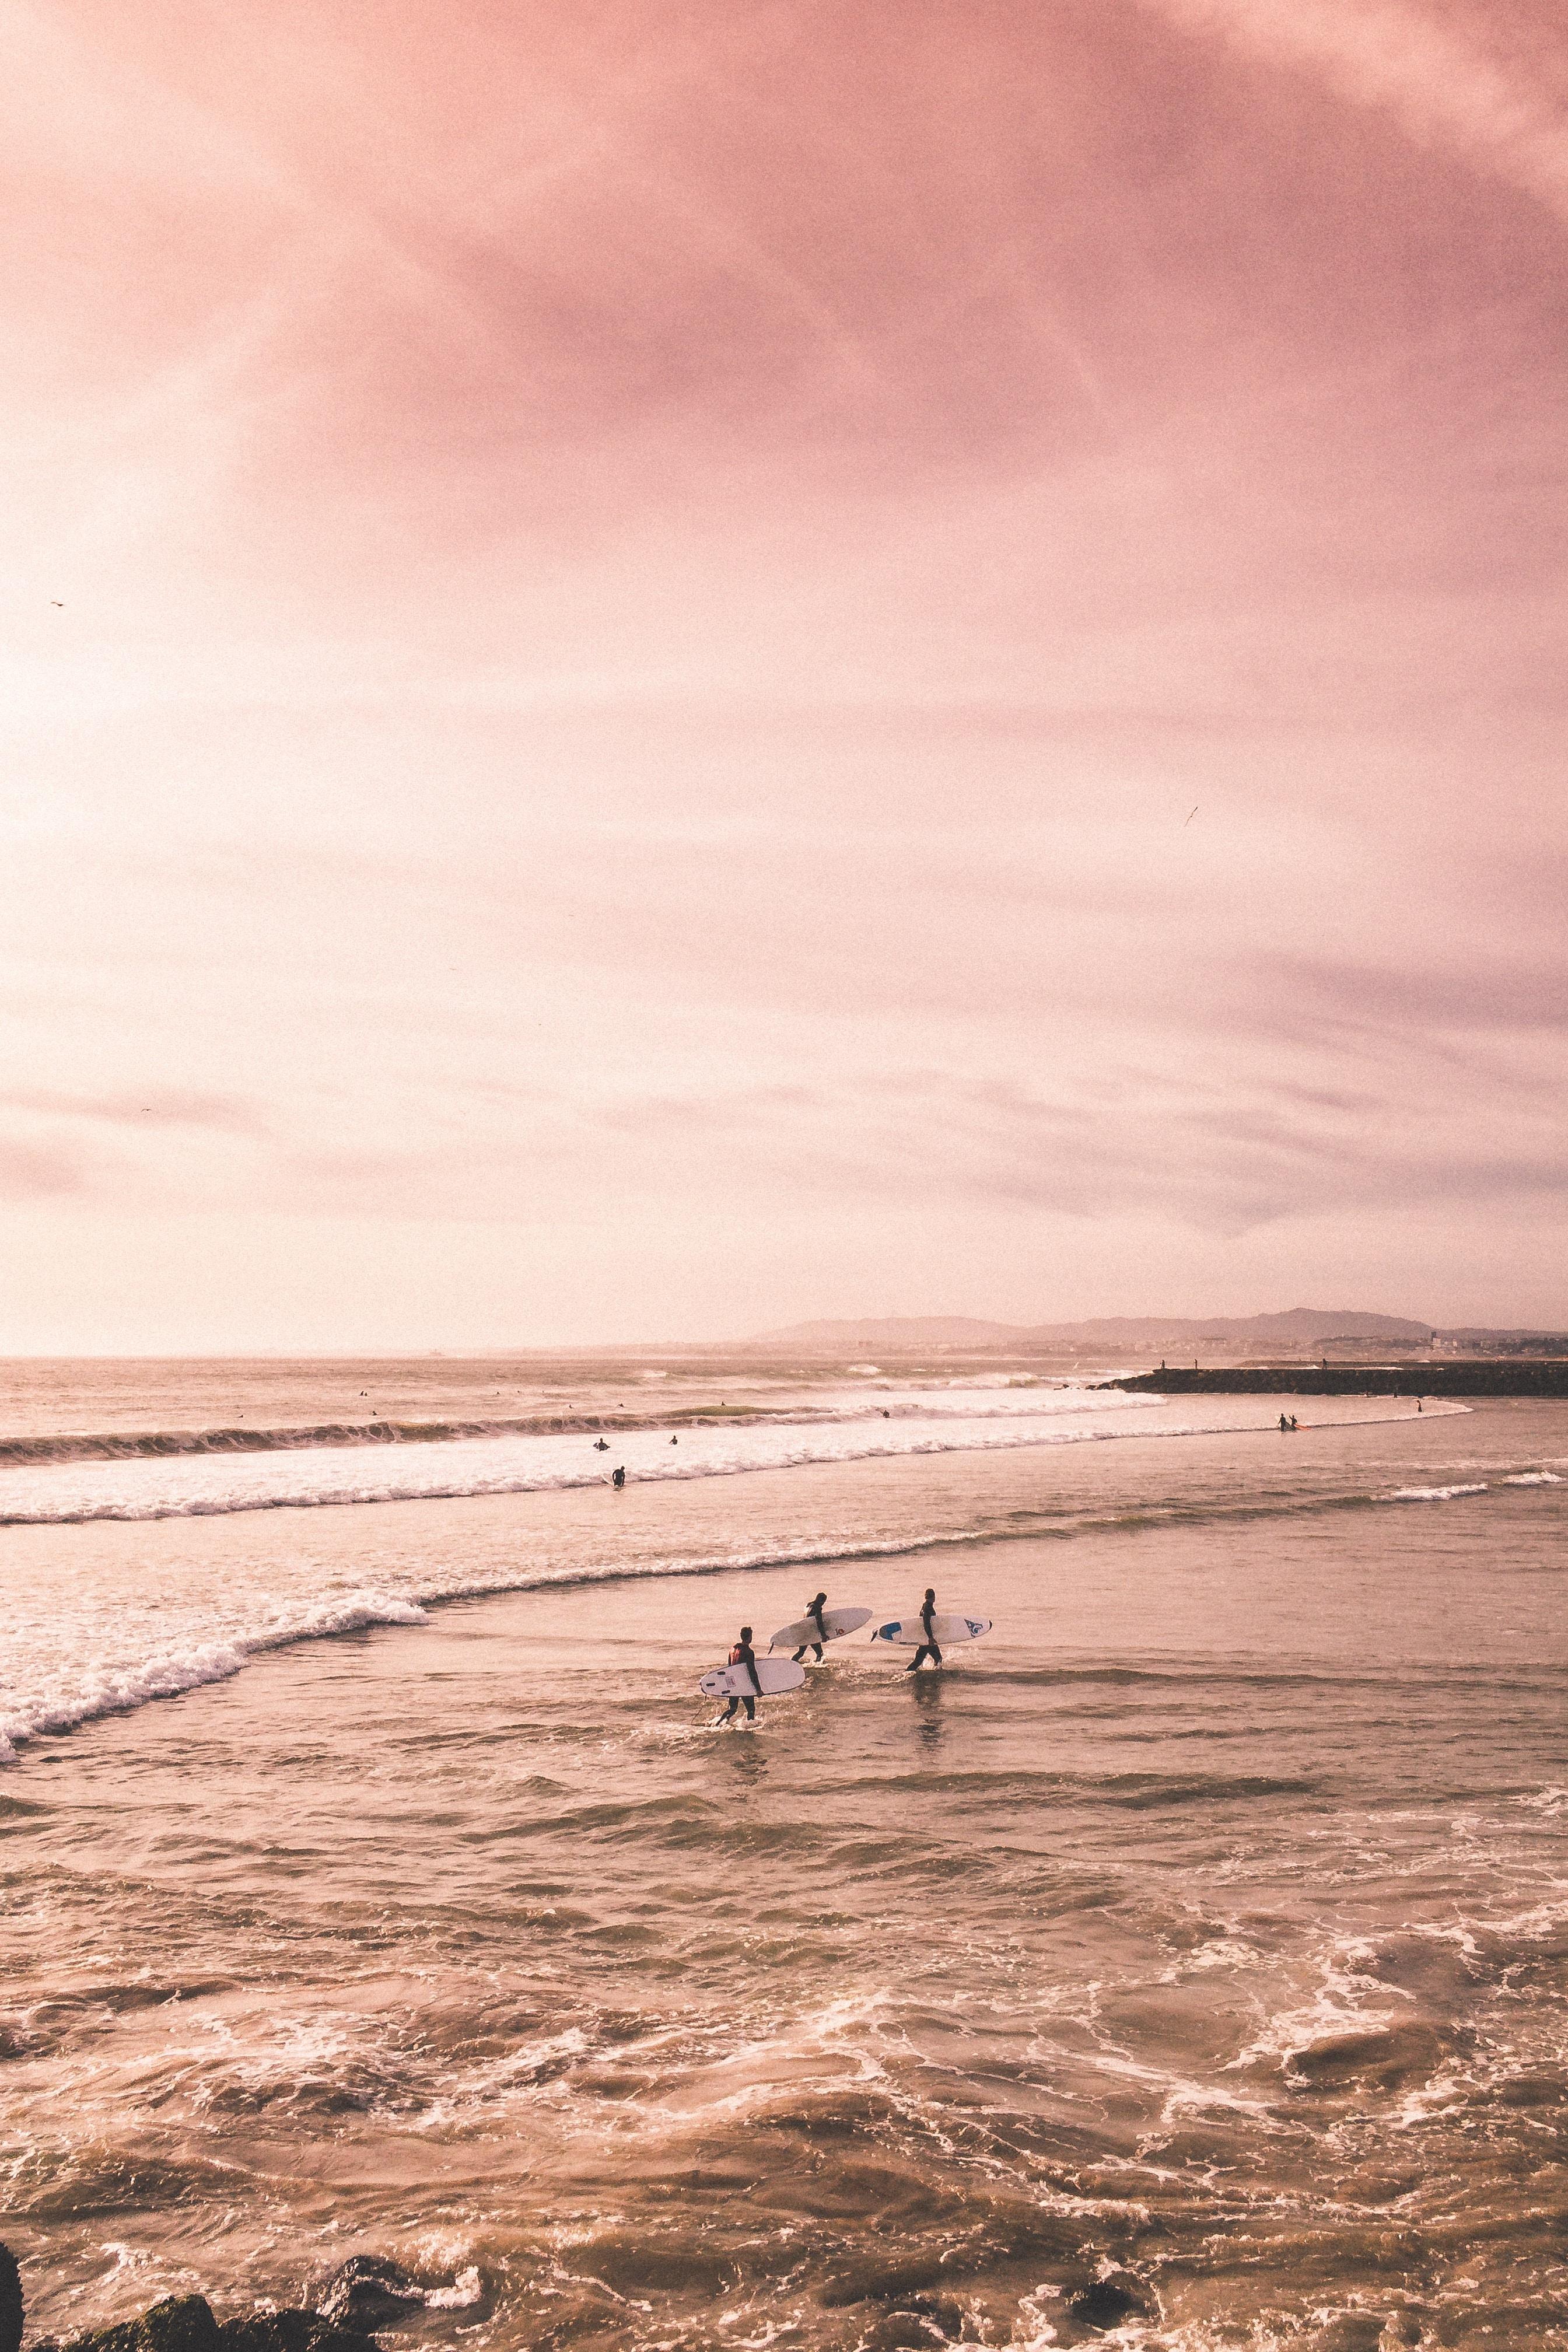 several people standing on seashore